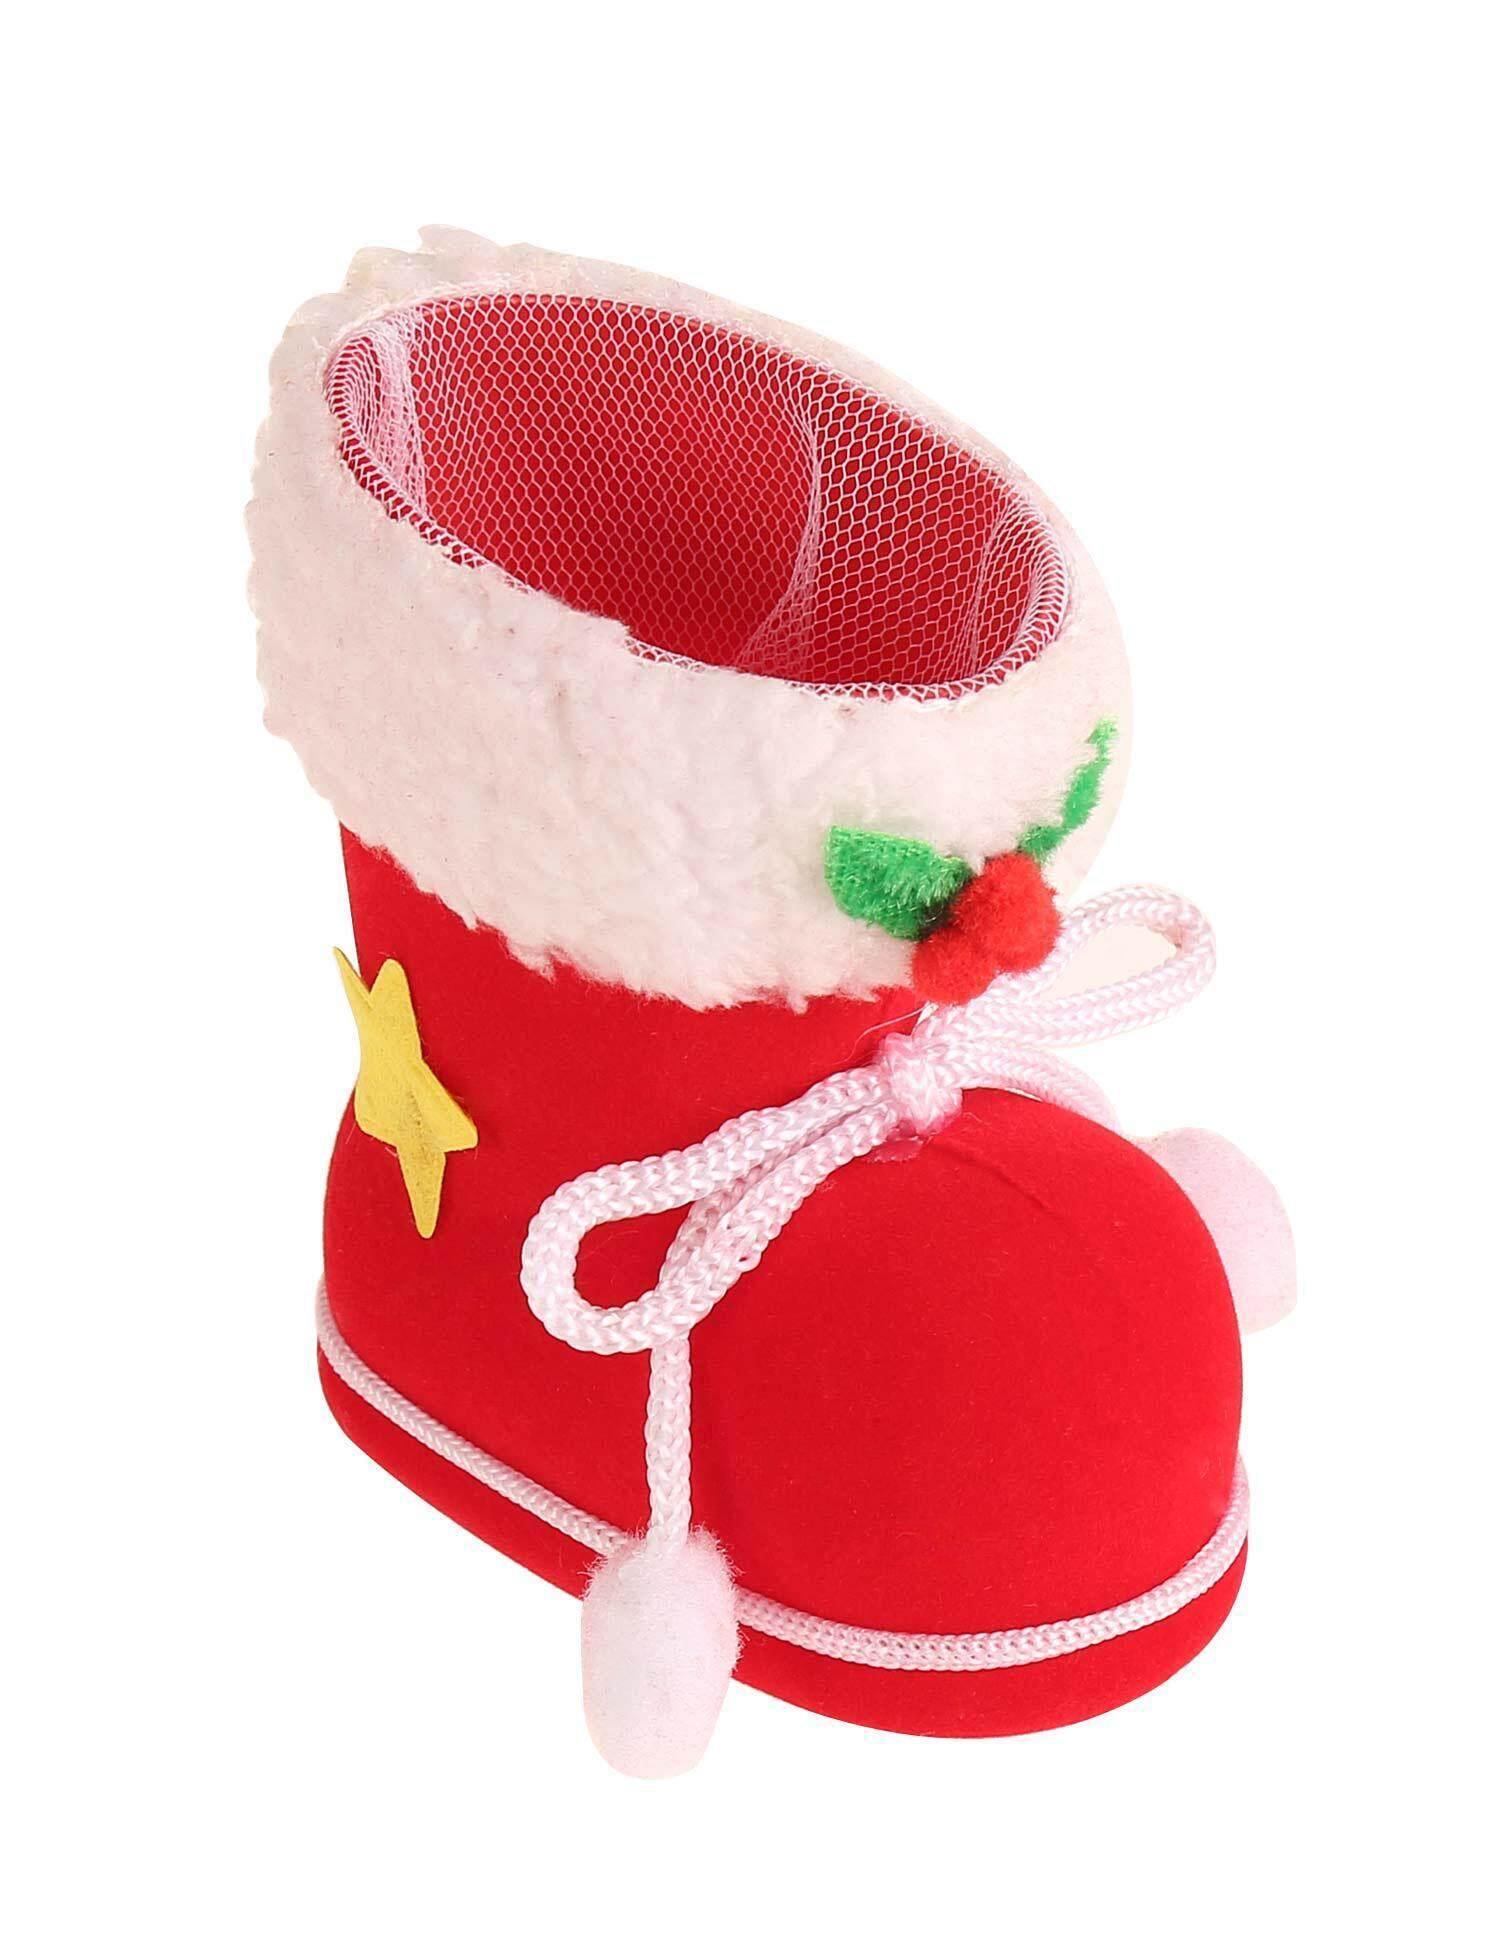 [Dijual Di Rincian Harga] Cyber Diskon Besar Sepatu Bot Permen Kumpulan Kaos Kaki Hadiah Natal Pohon Natal Tas Dekorasi Ruangan Anak-anak Santa Baru (1) -Intl